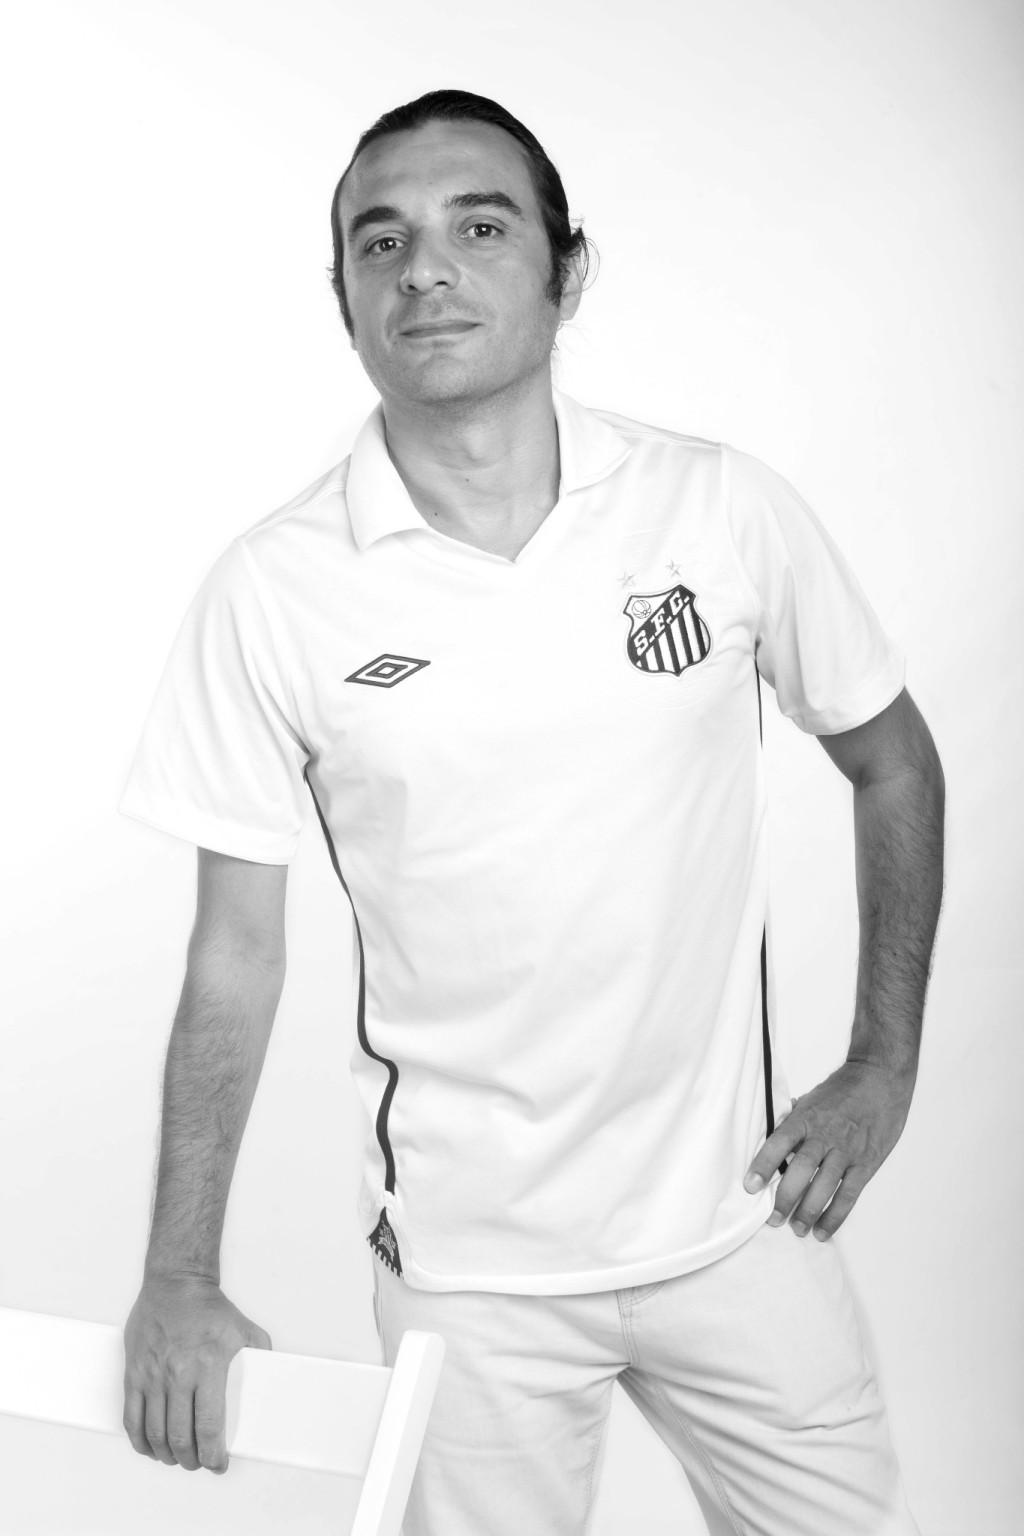 Airton Oliveira da Silva